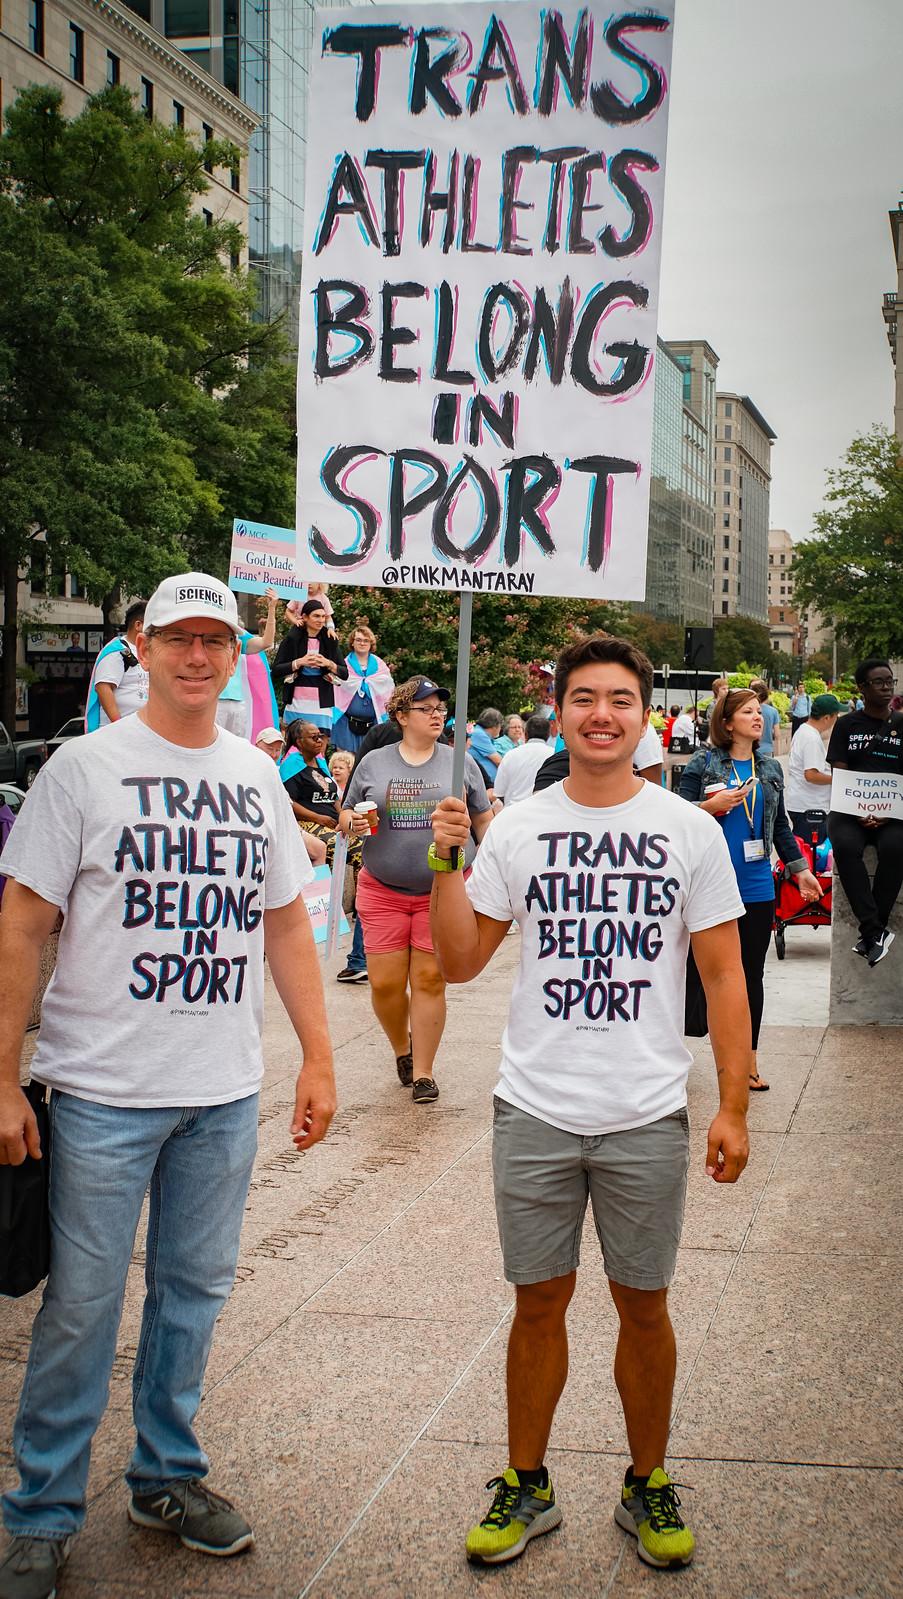 2019.09.28 National Trans Visibility March, Washington, DC USA 271 69015